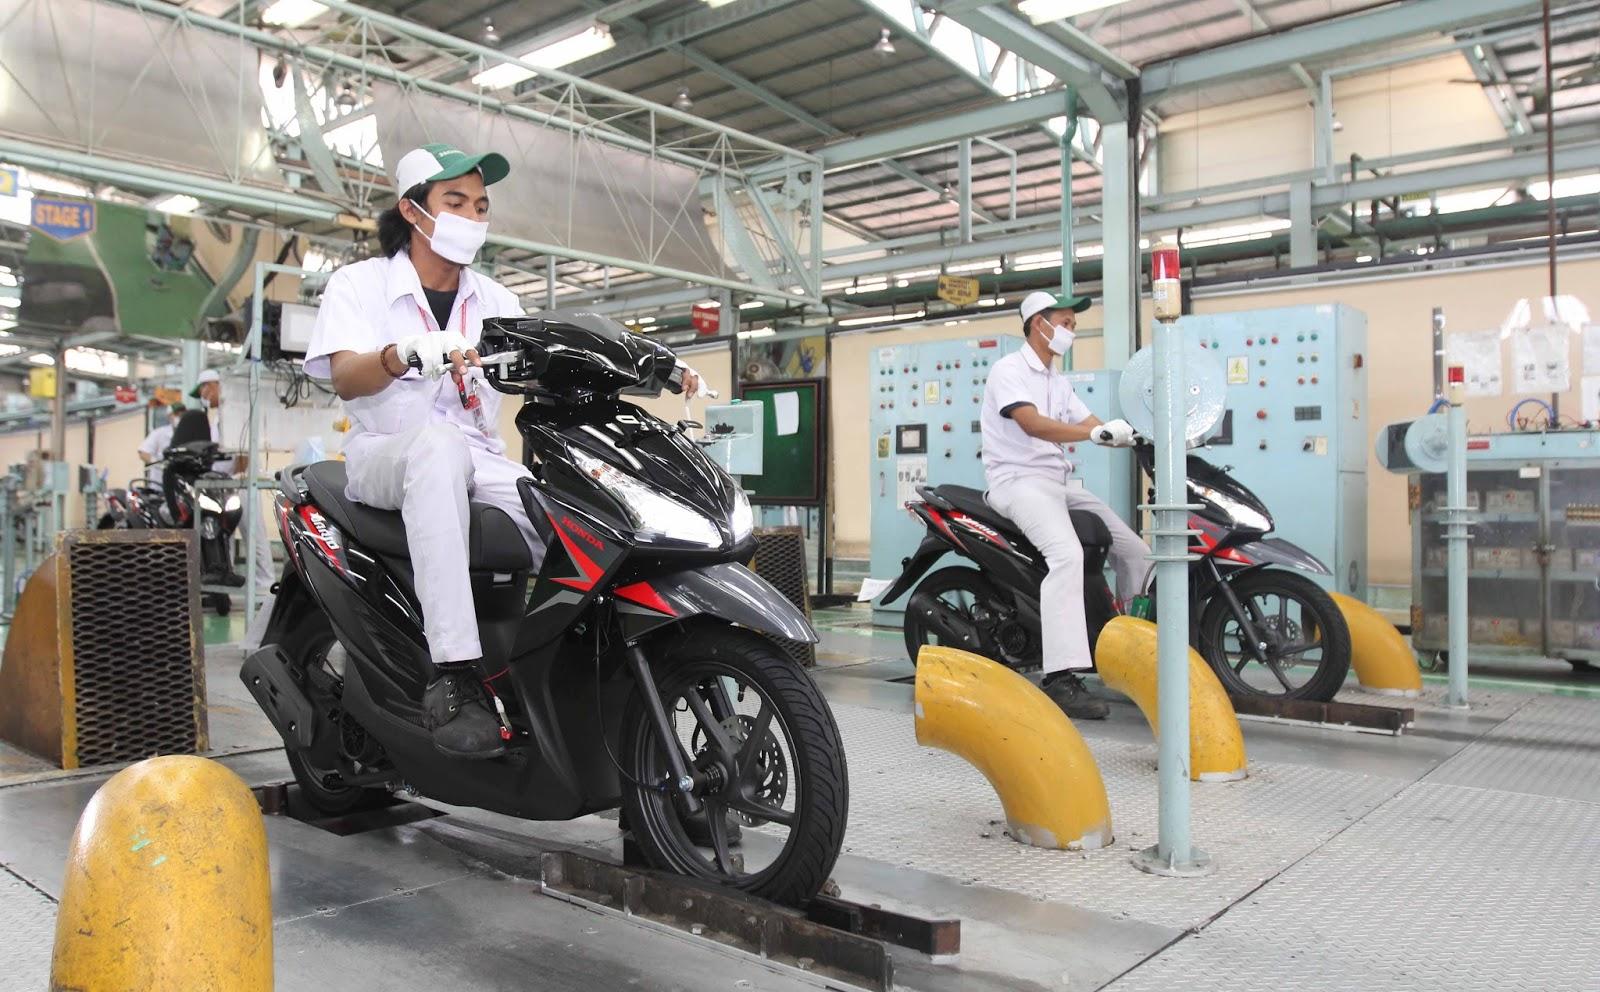 Horas Hondaku January 2017 New Vario 110 Esp Cbs Iss Grande White Tangerang Honda Segarkan Tampilan